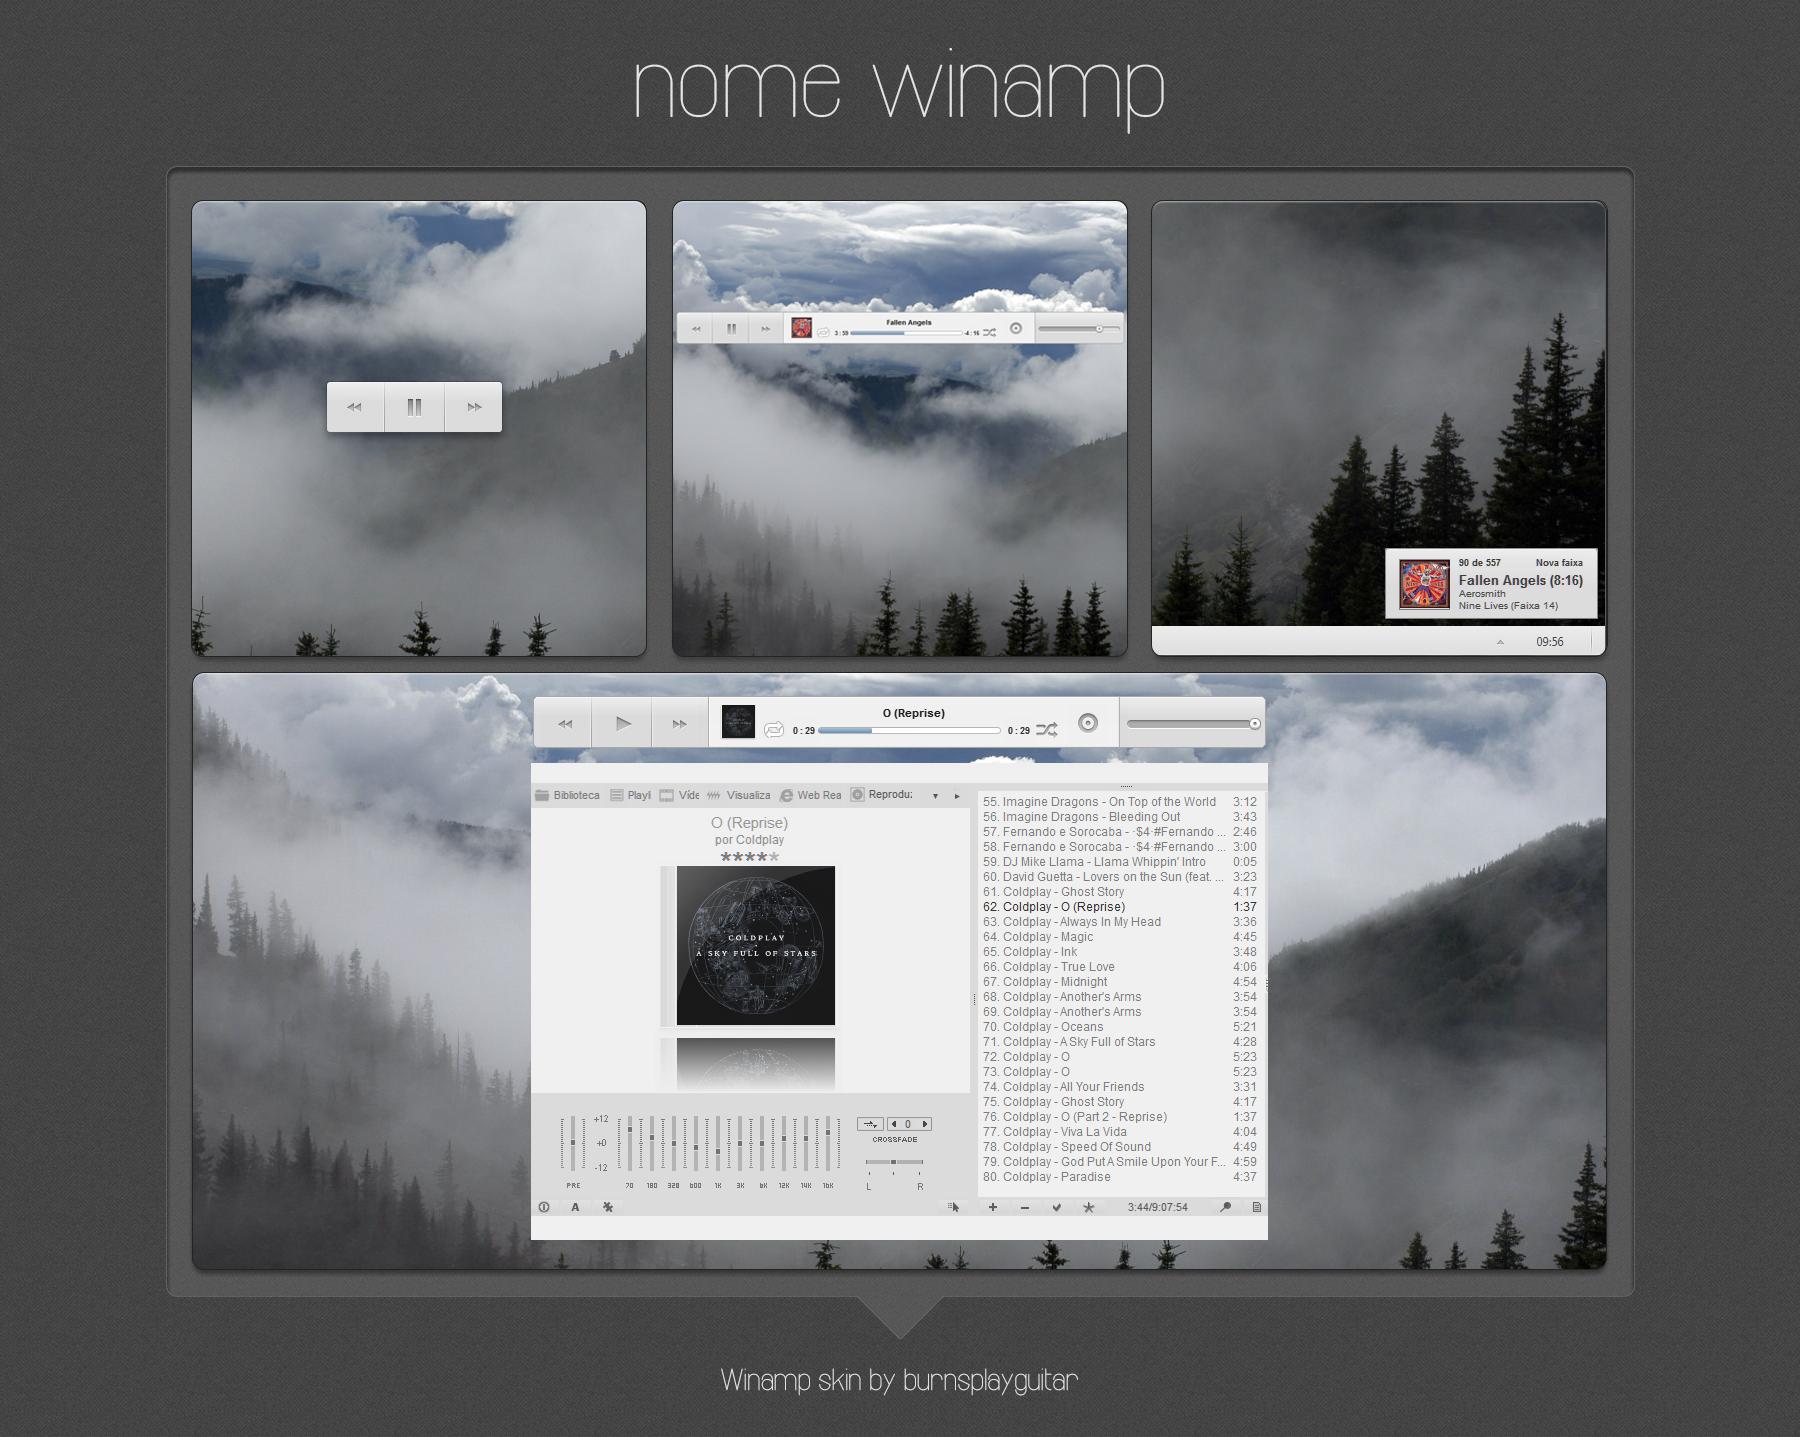 Nome Winamp by burnsplayguitar